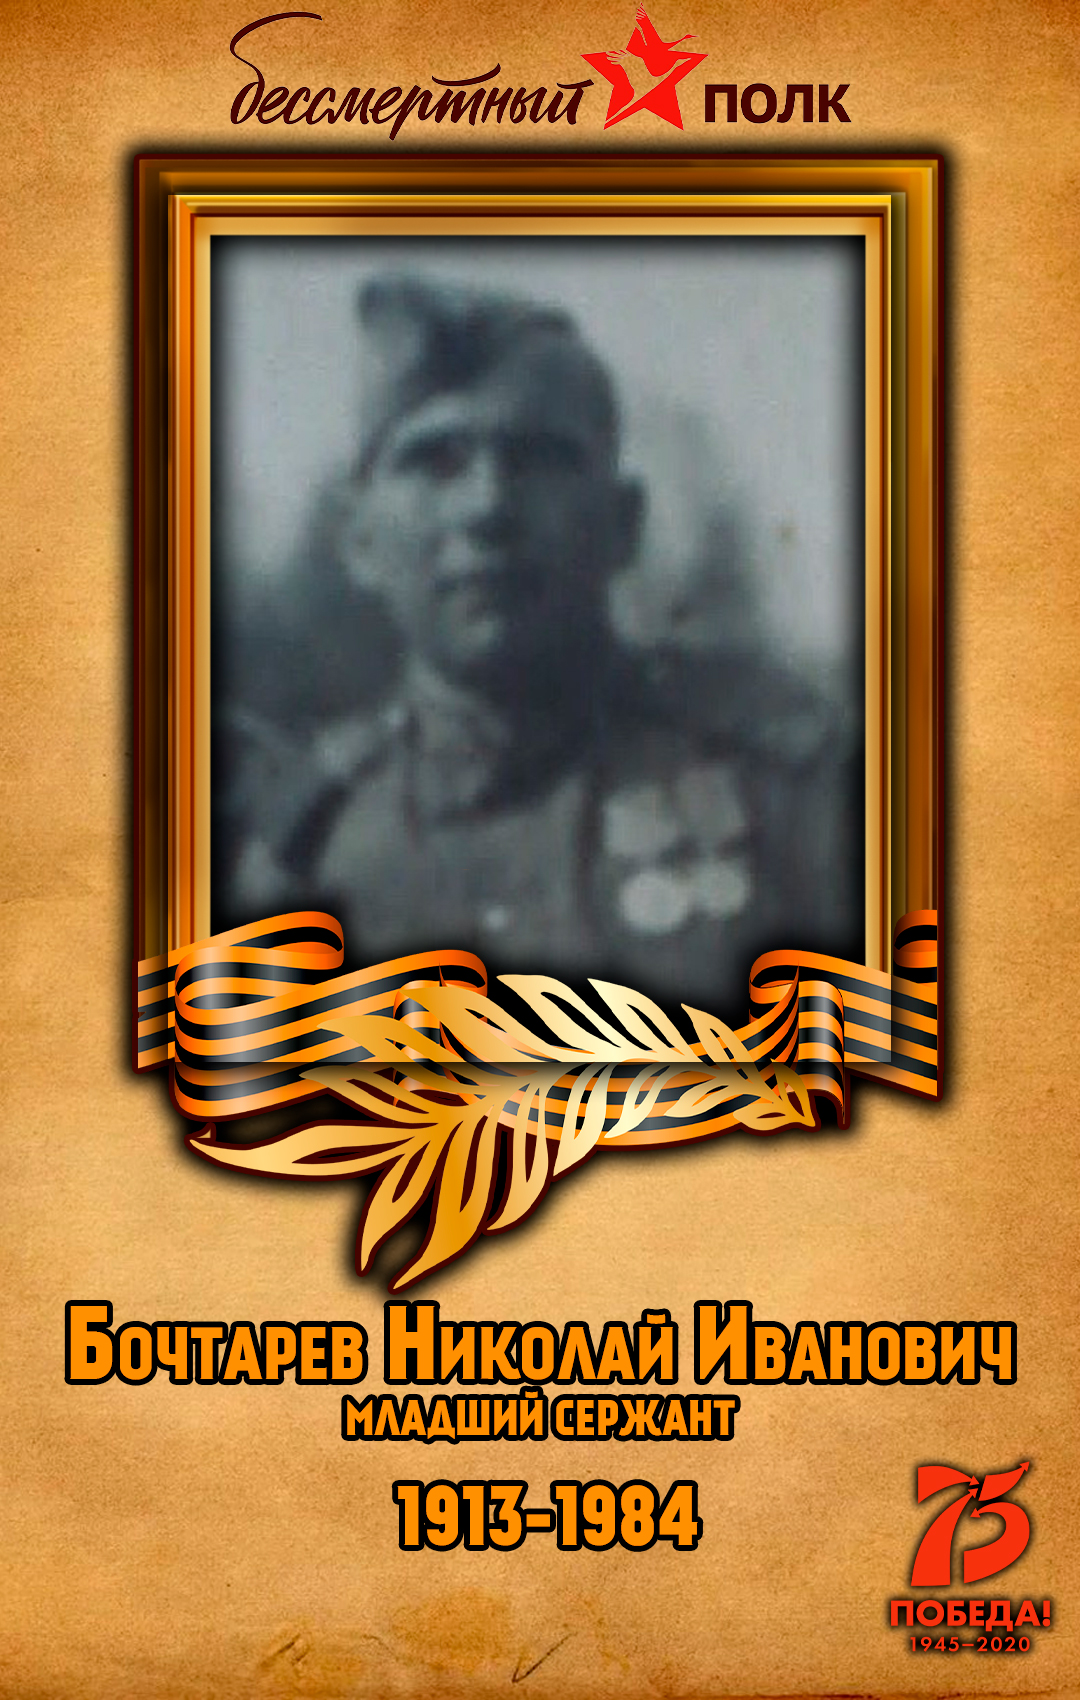 Бочтарев-Николай-Иванович